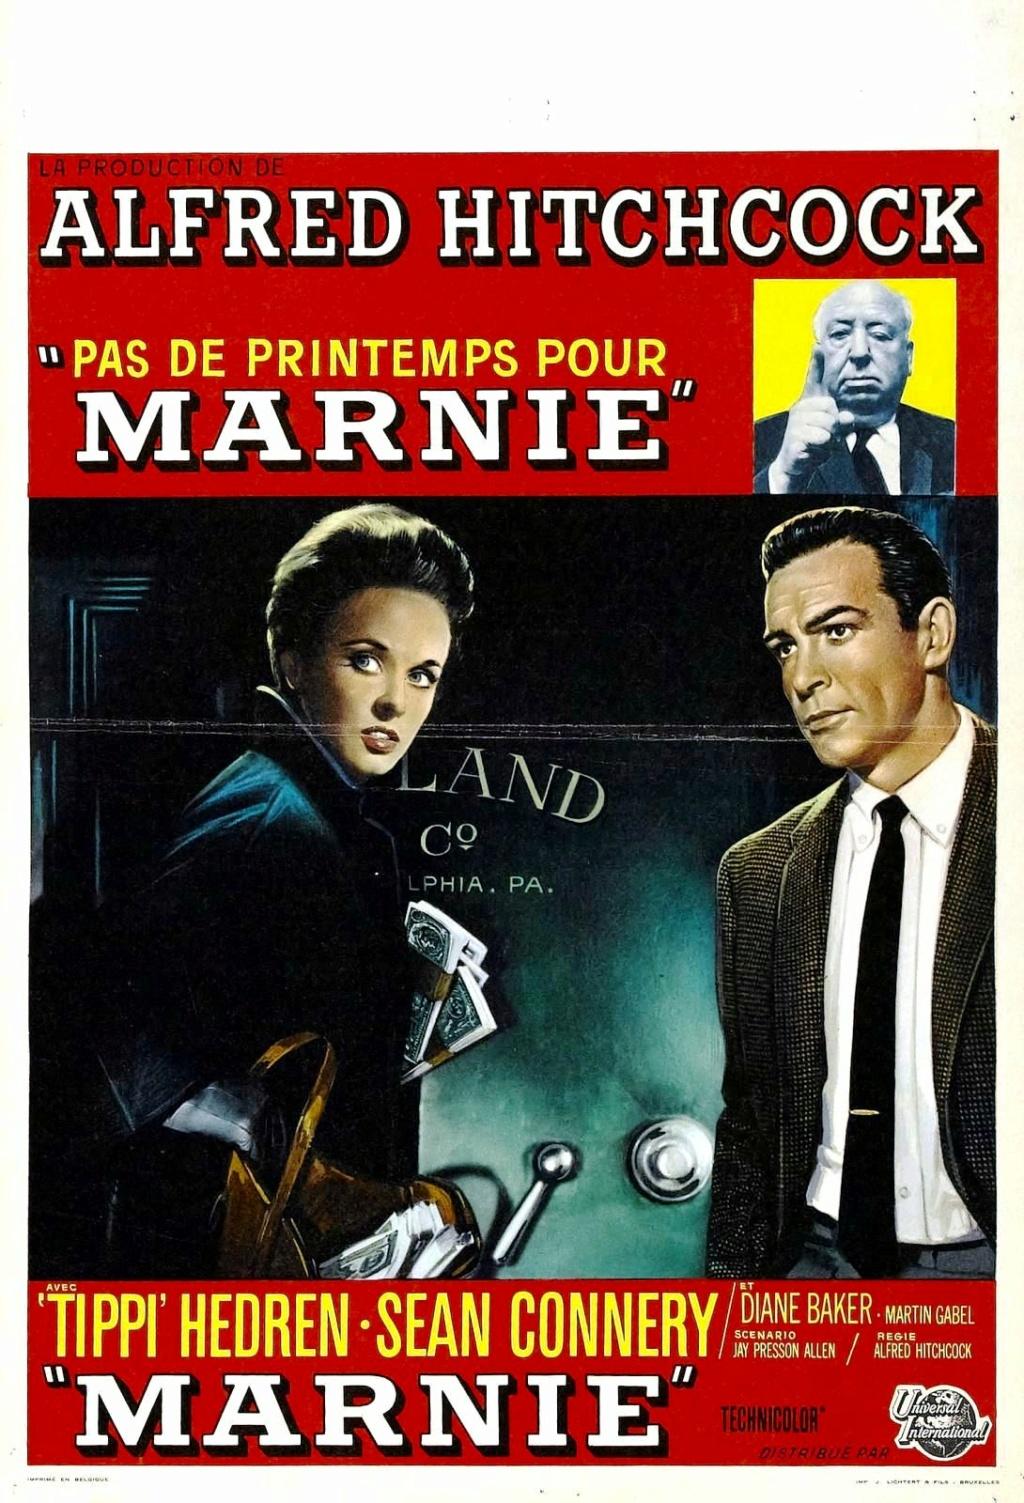 JE VIENS DE MATER UN FILM ! 01157